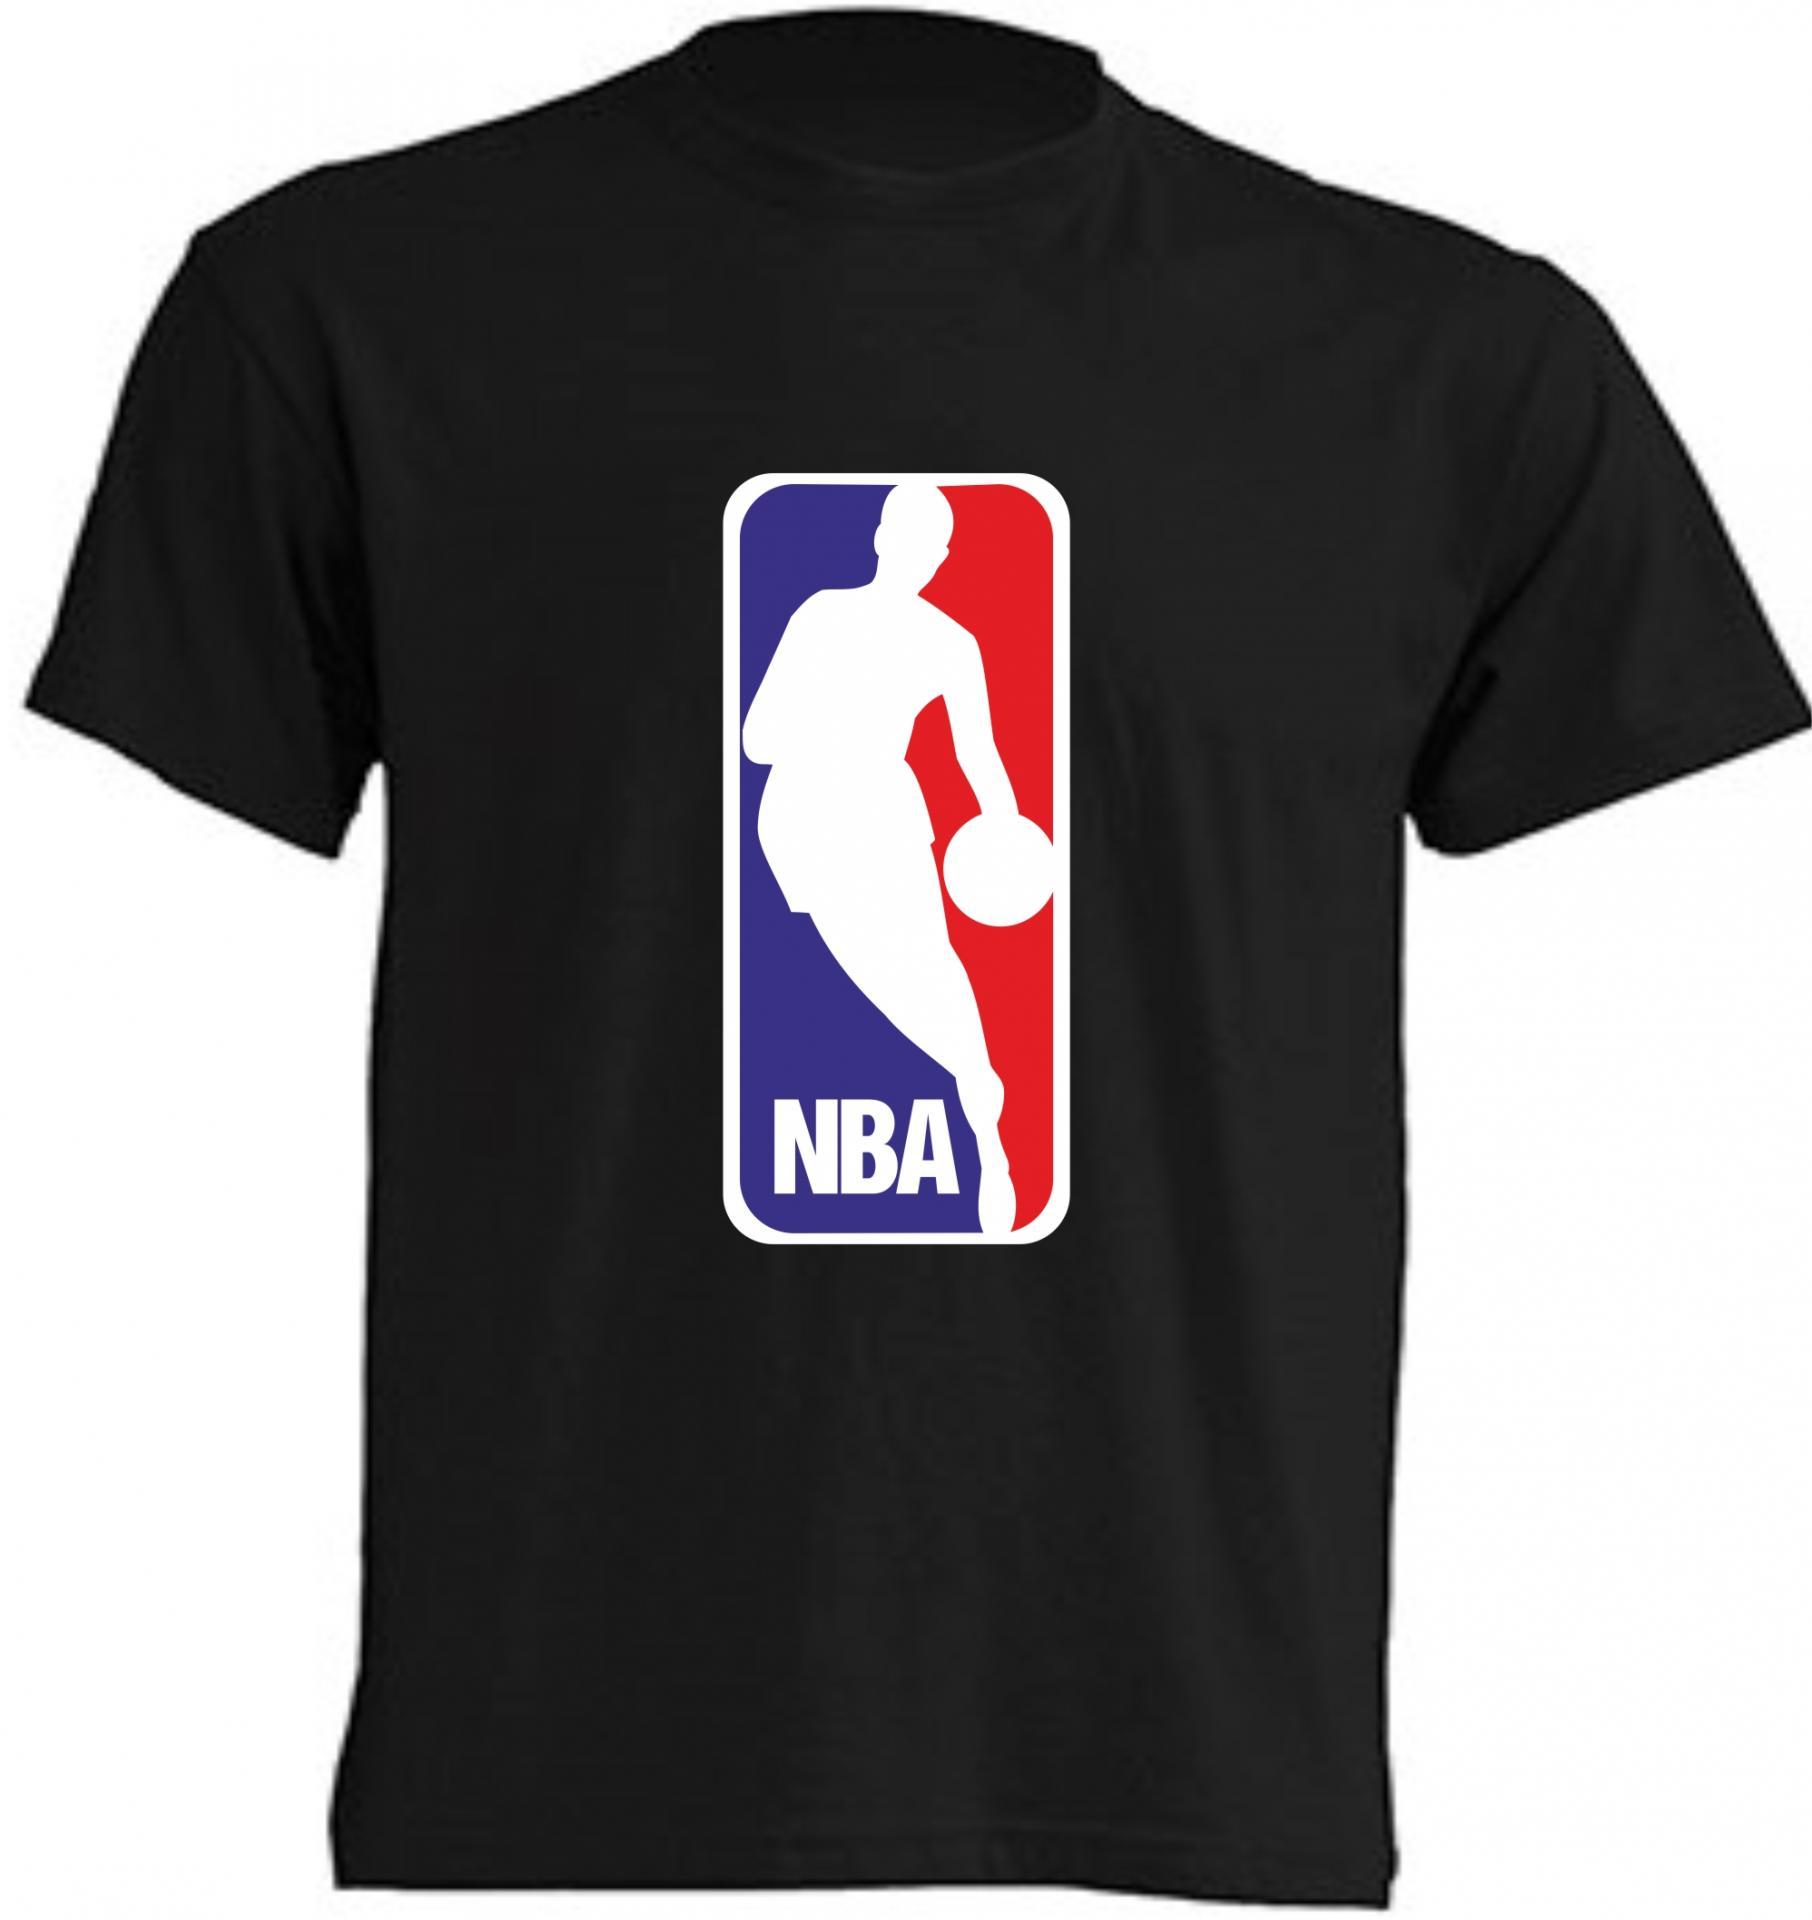 CAMISETA NBA NEGRA